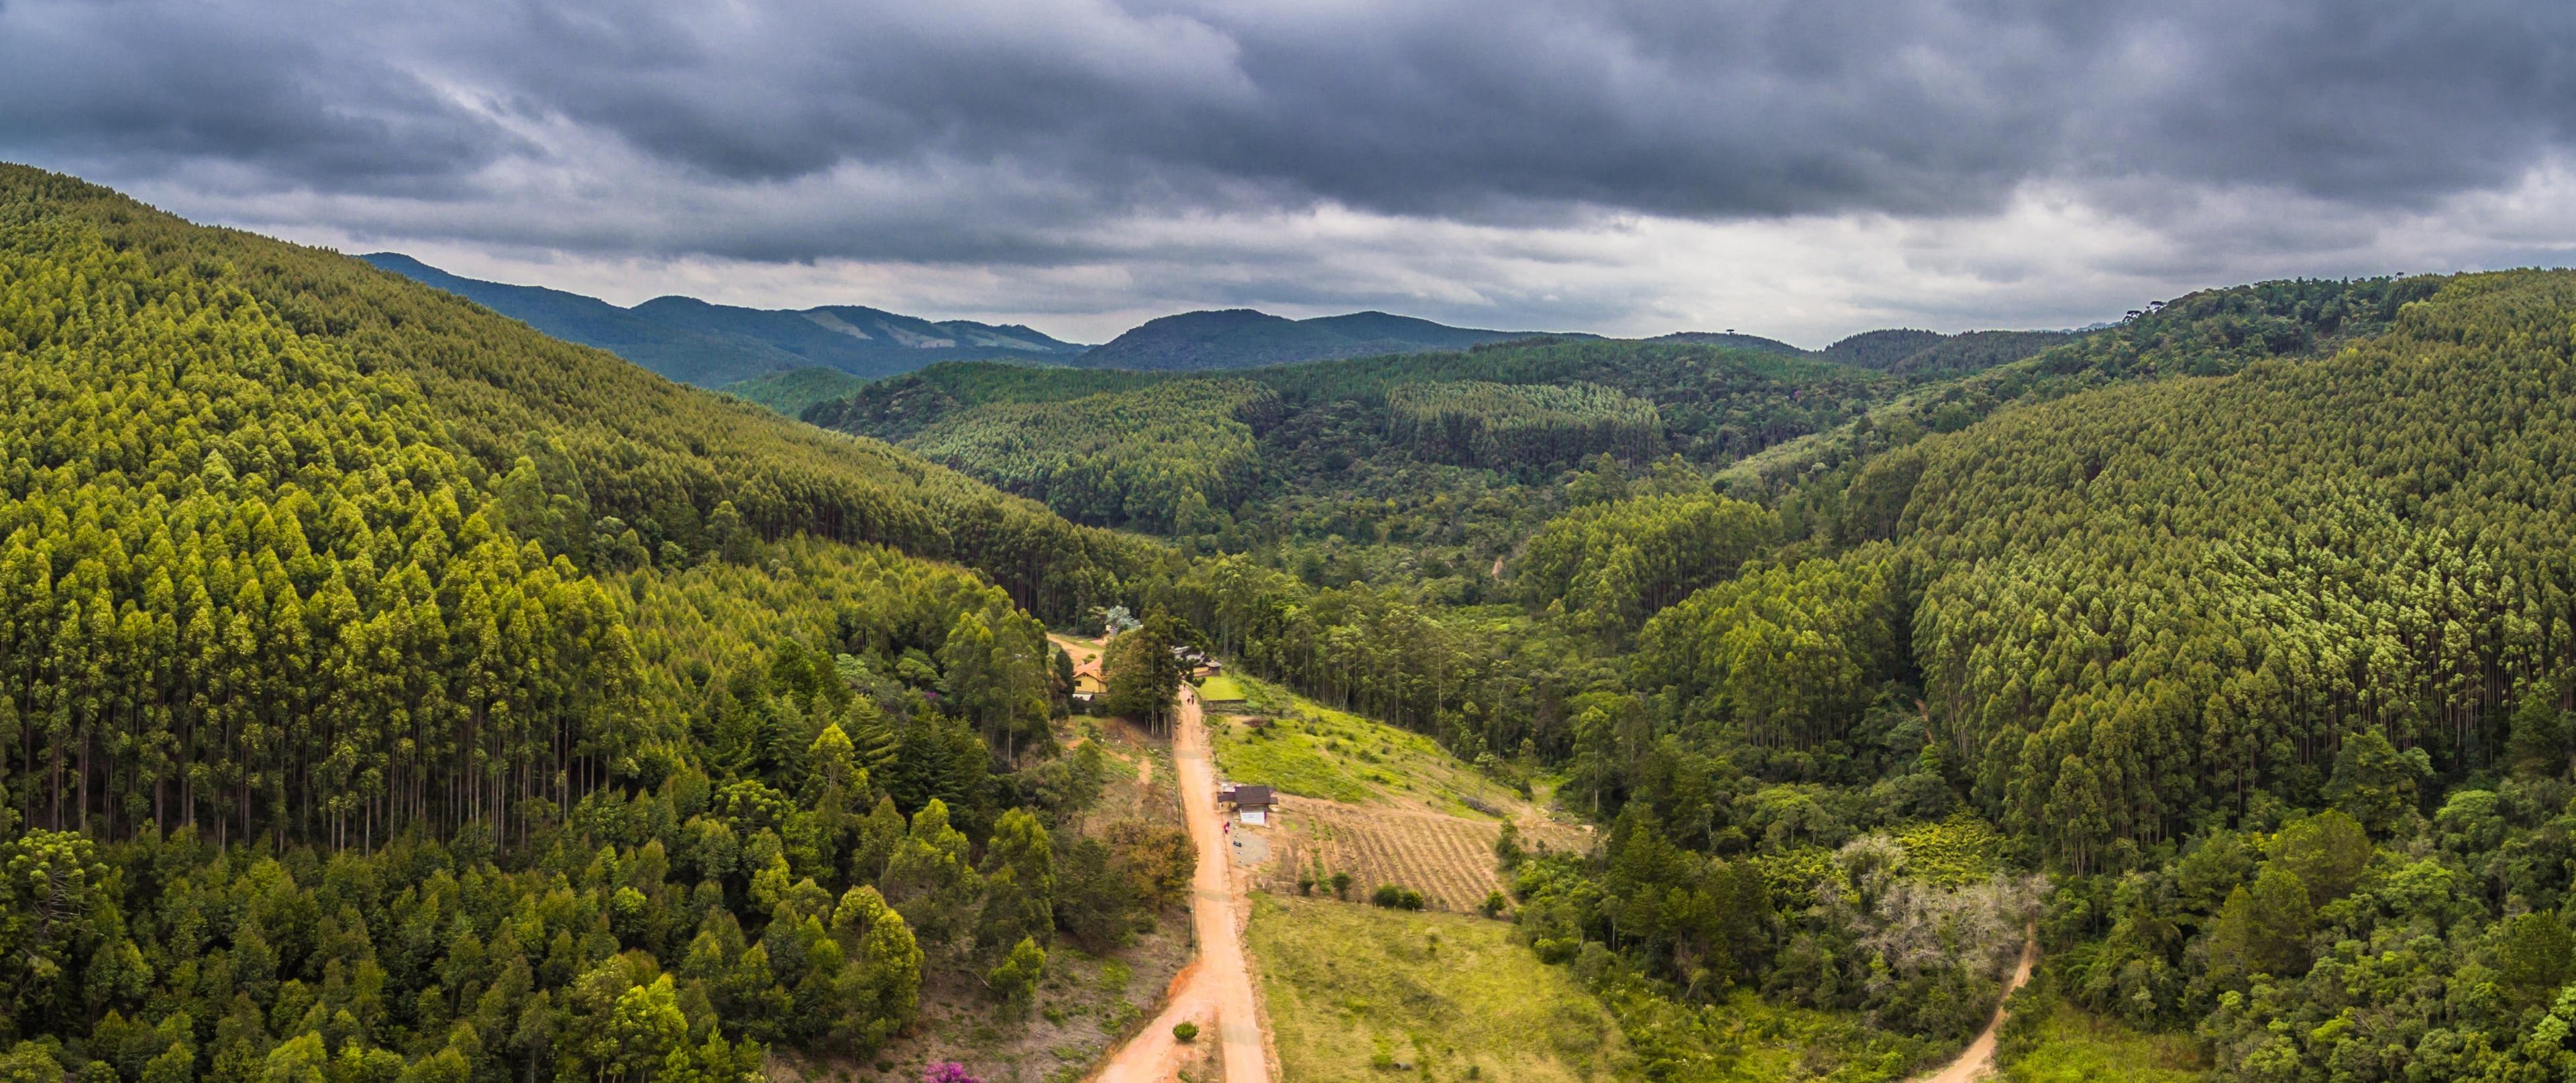 Monte Verde, Camanducaia, Minas Gerais (estado), Brasil